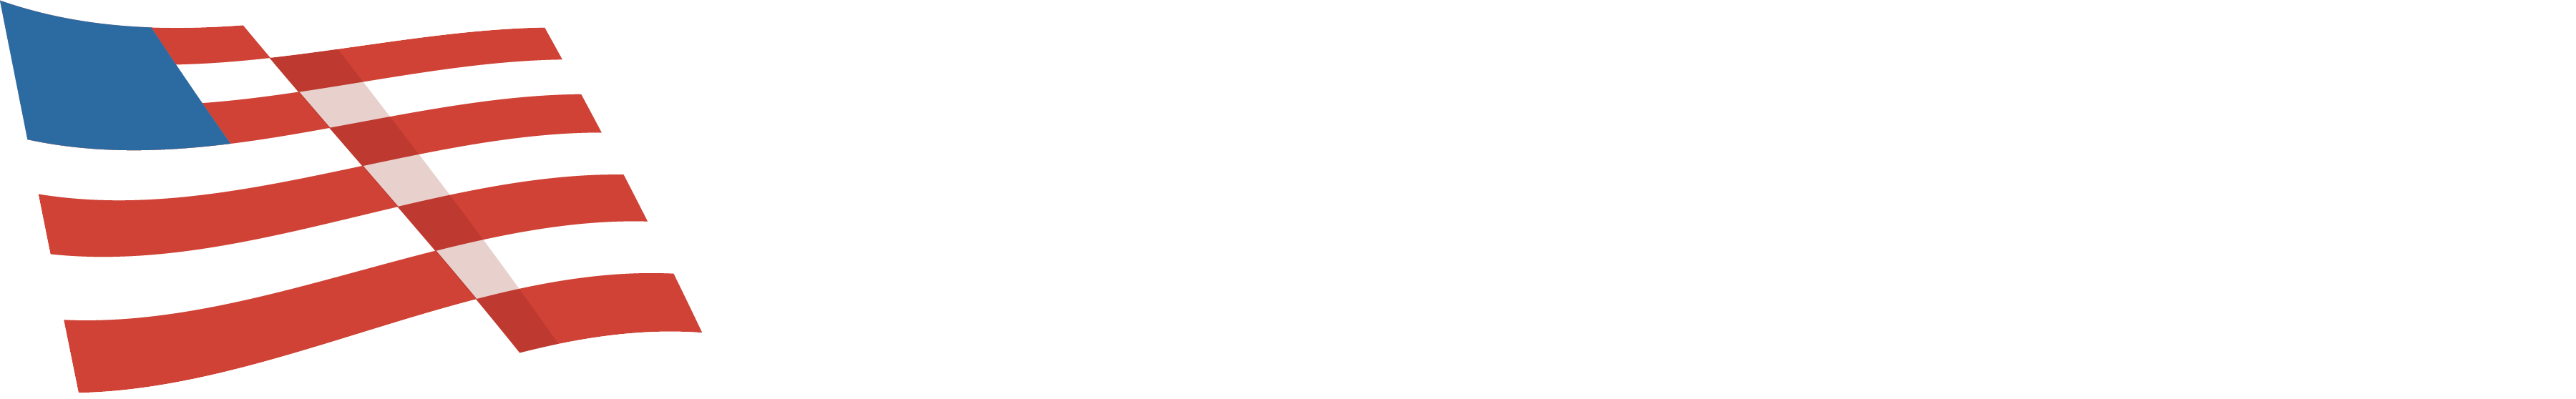 Advancing American Freedom